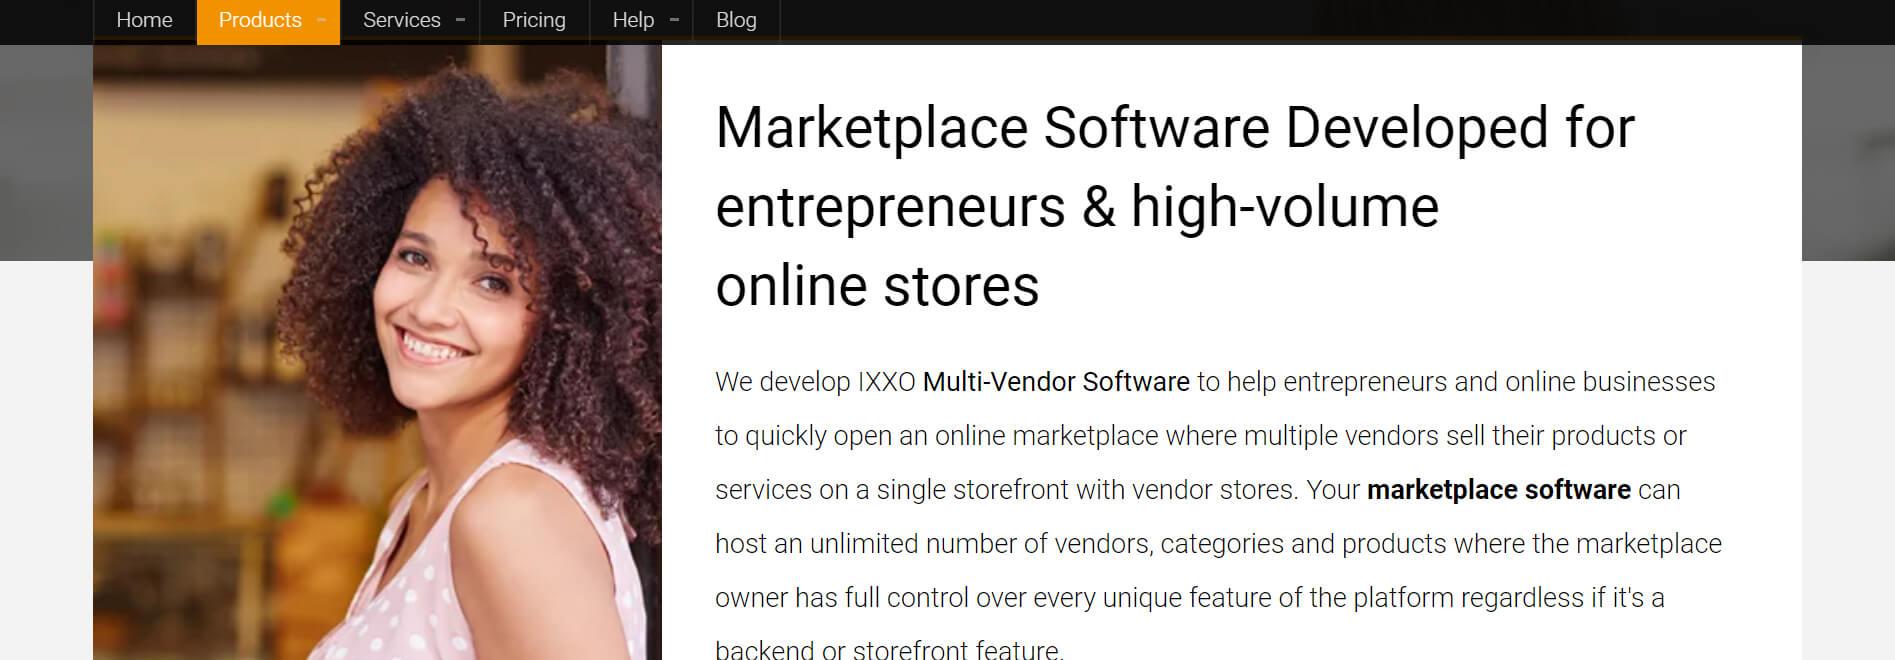 IXXOCart Multi Vendor Platform & Shopping Cart Solution & Ecommerce Software